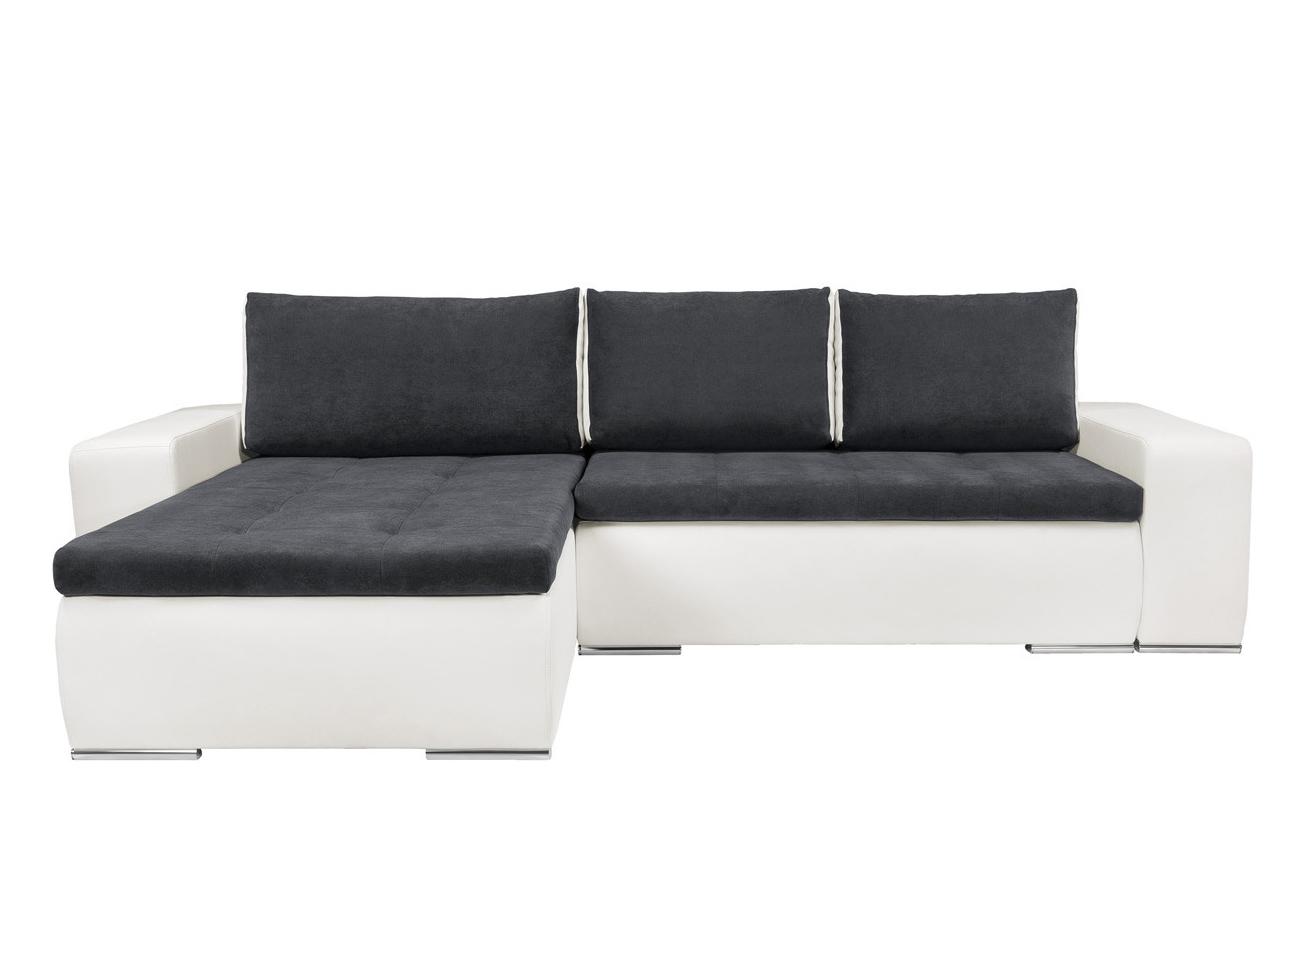 Rohová sedací souprava - BRW - Marina II Lux 3DL.URC bílá/modrošedá (L)